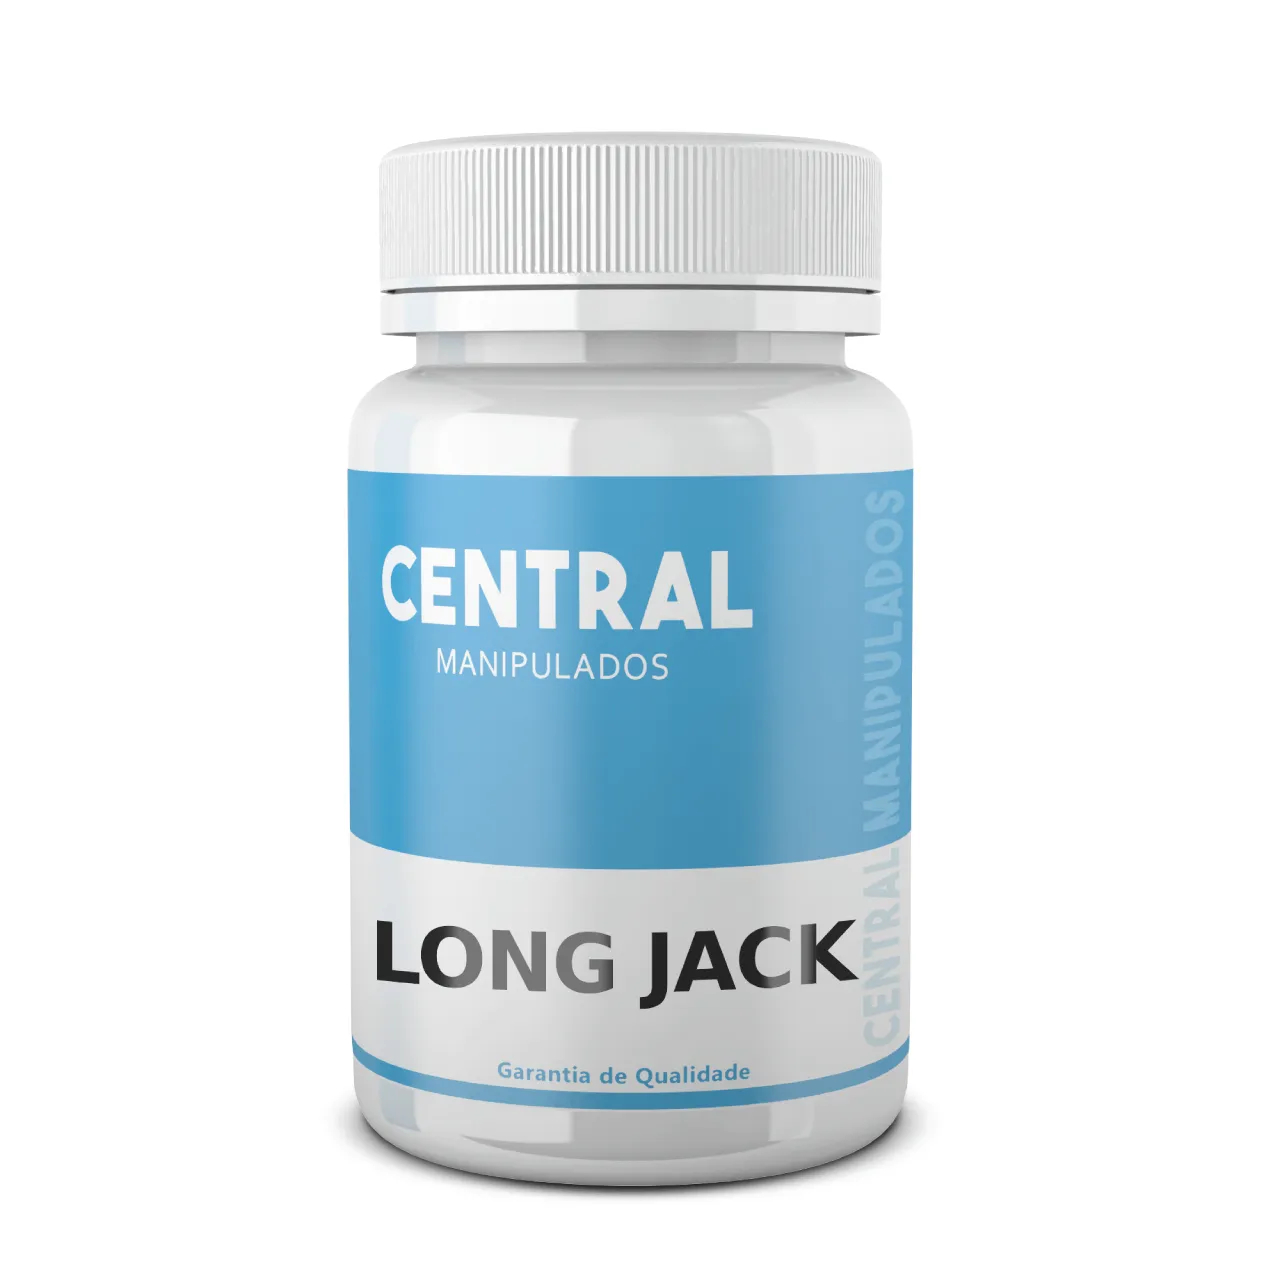 Long Jack 400mg - 30 cápsulas - Performance, Aumento da Testosterona